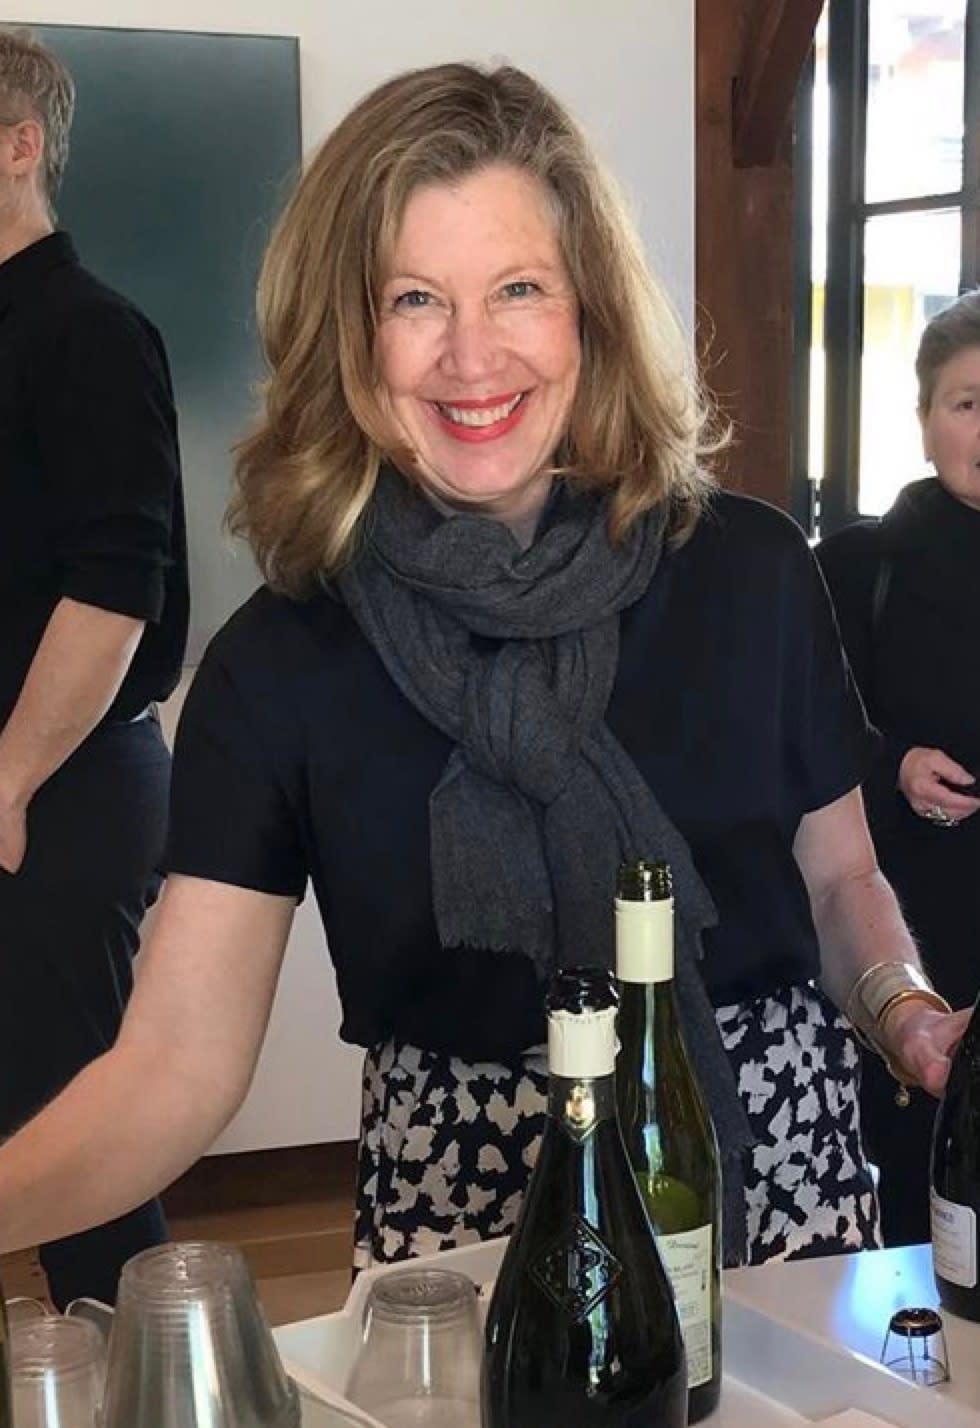 Kenise Barnes, Director